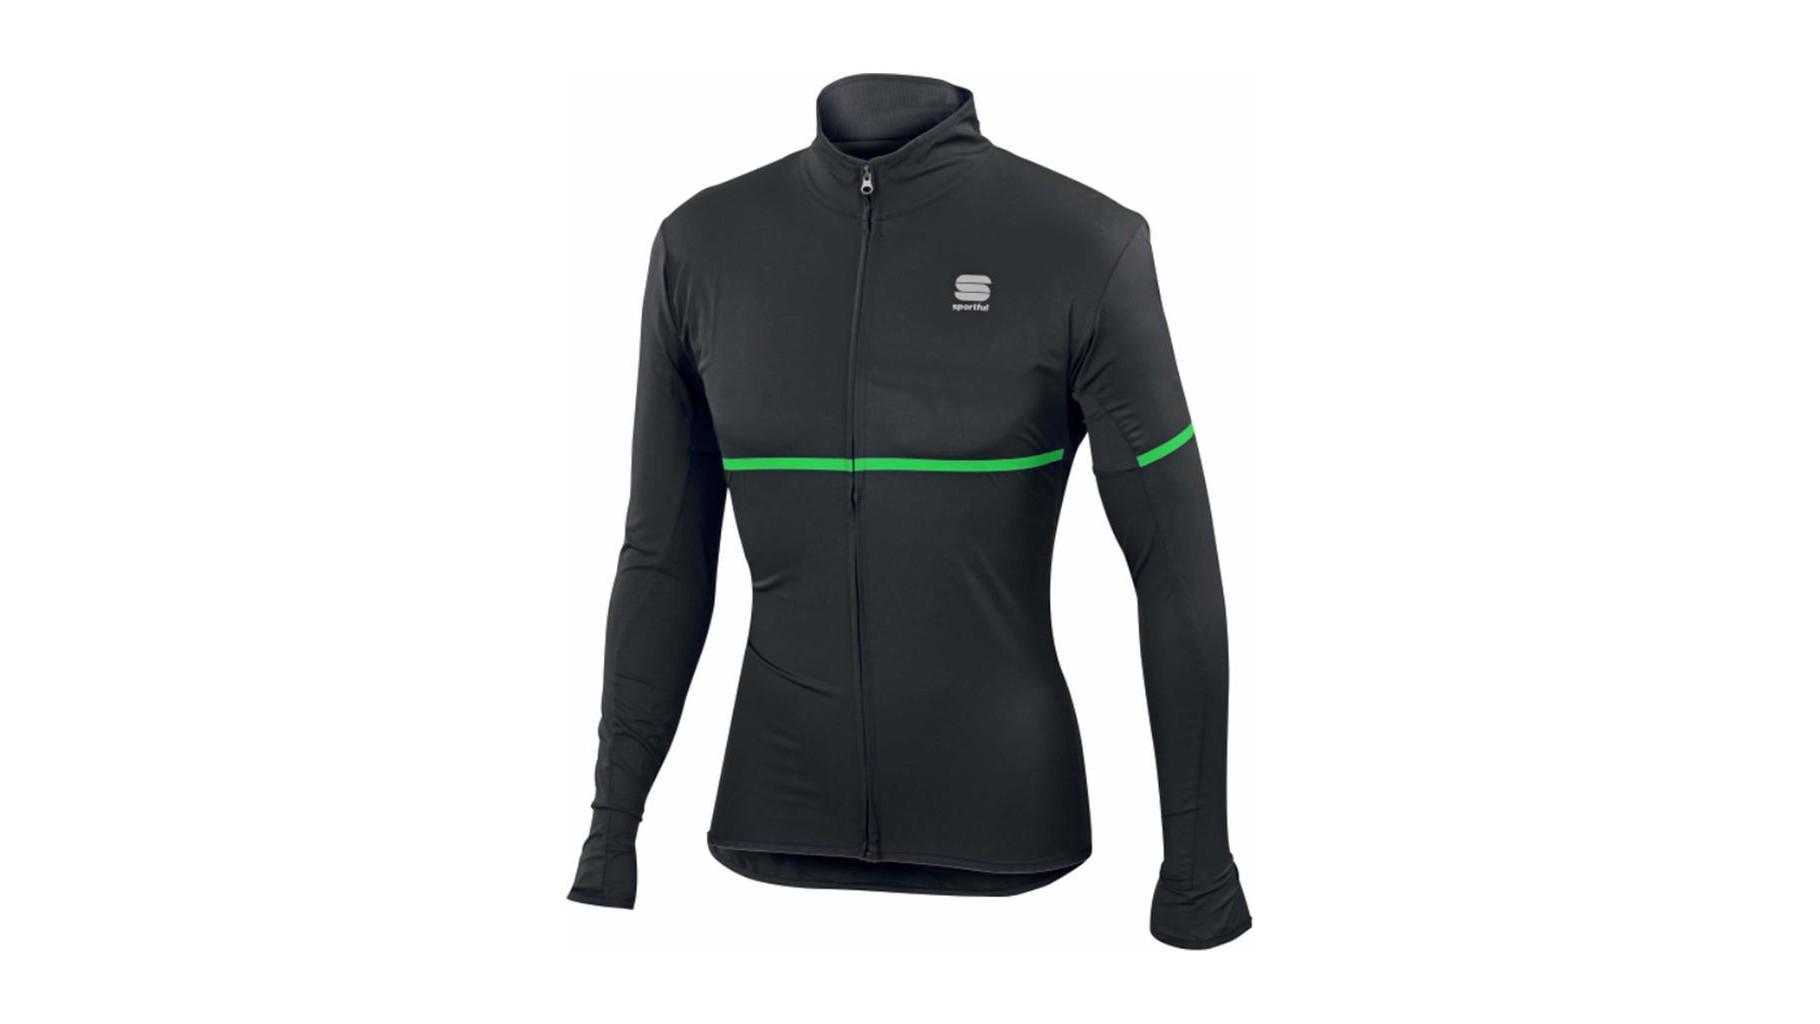 Sportful Giara jacket